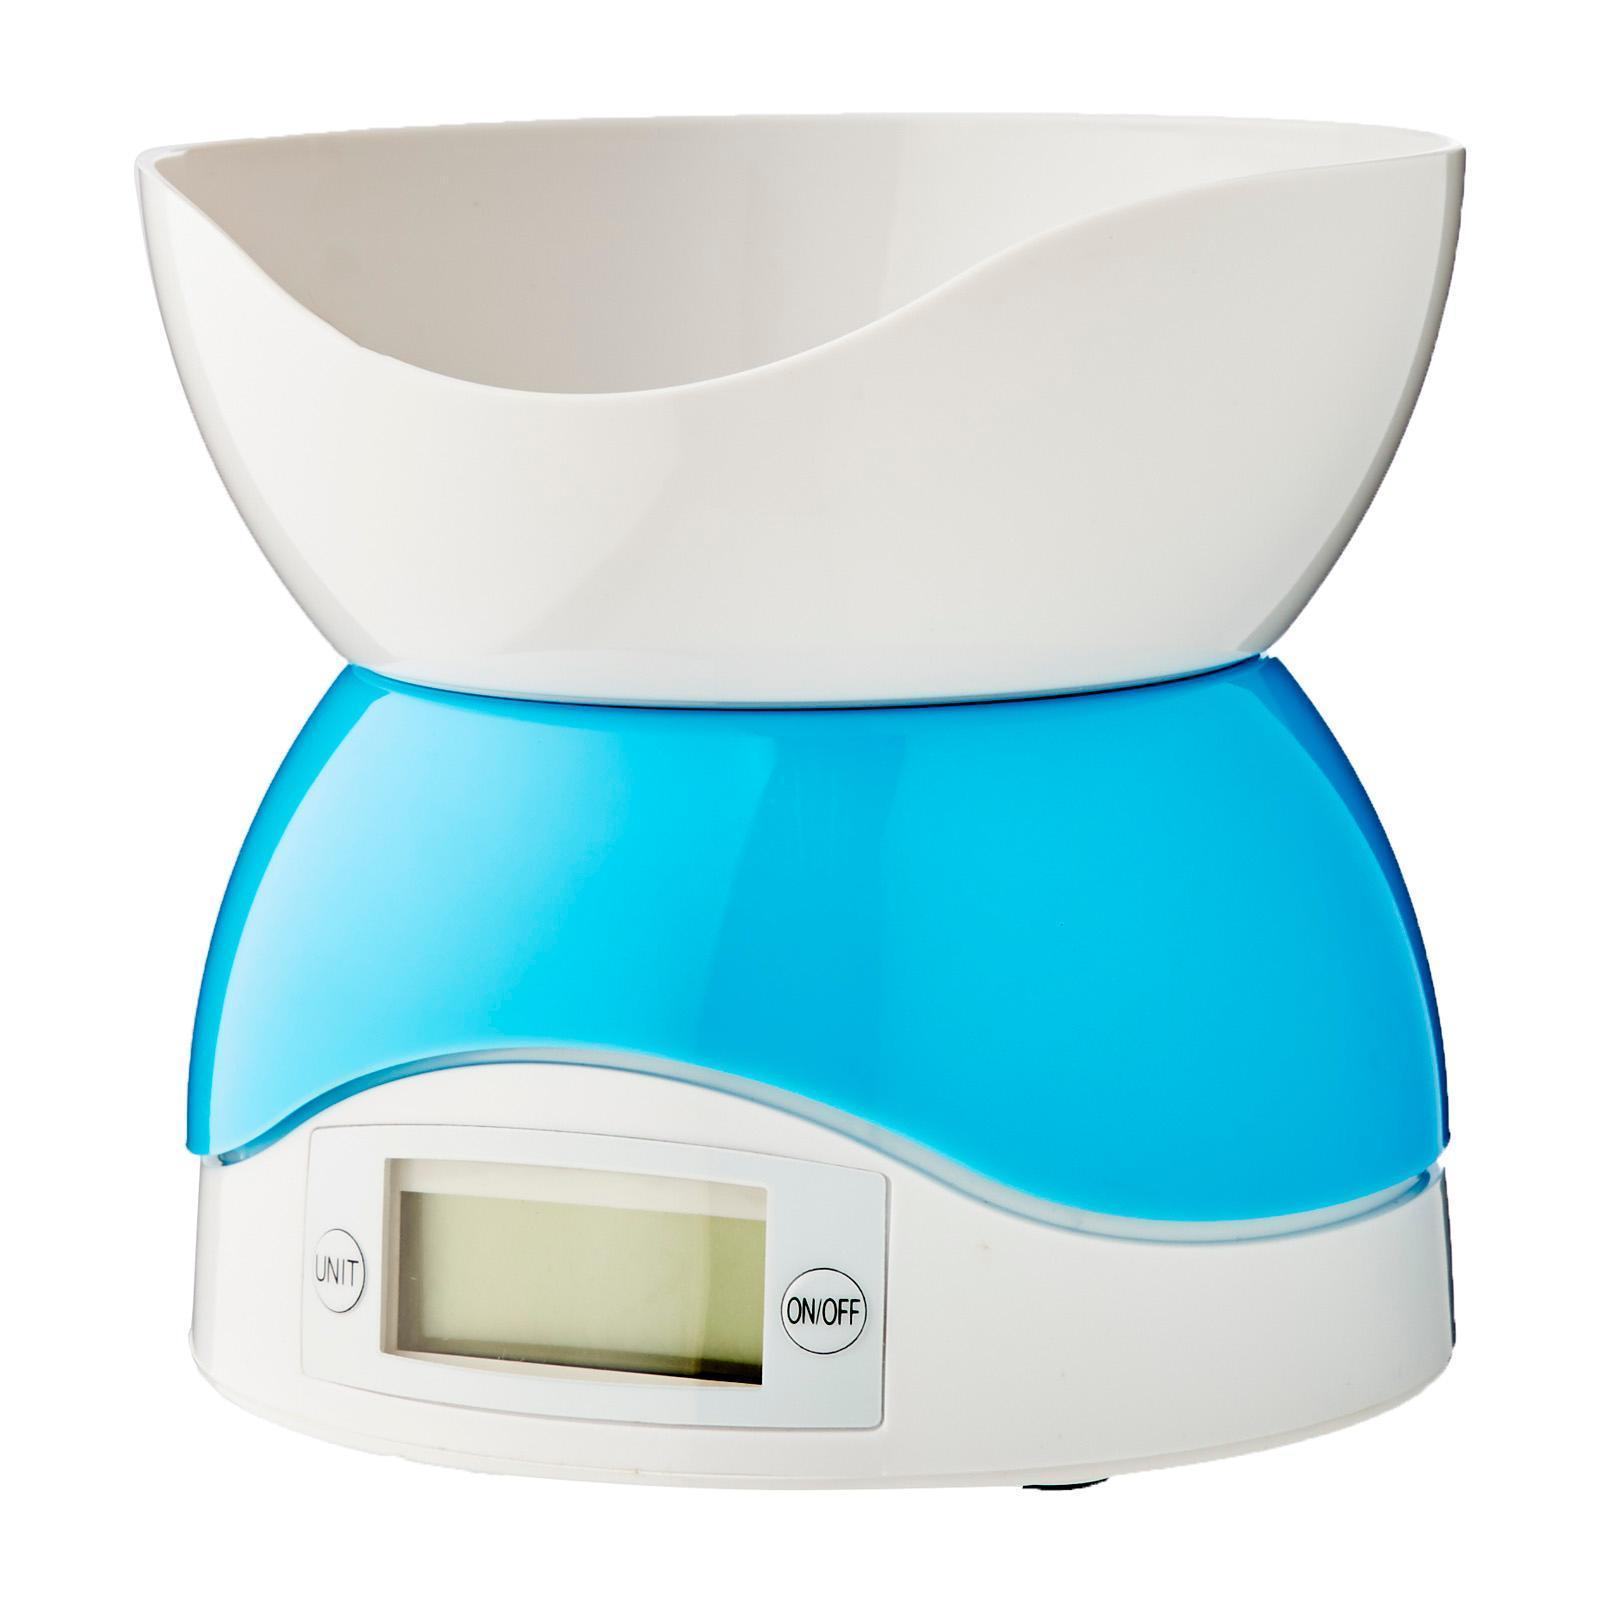 Sugasa Electronic Kitchen Scale Blue